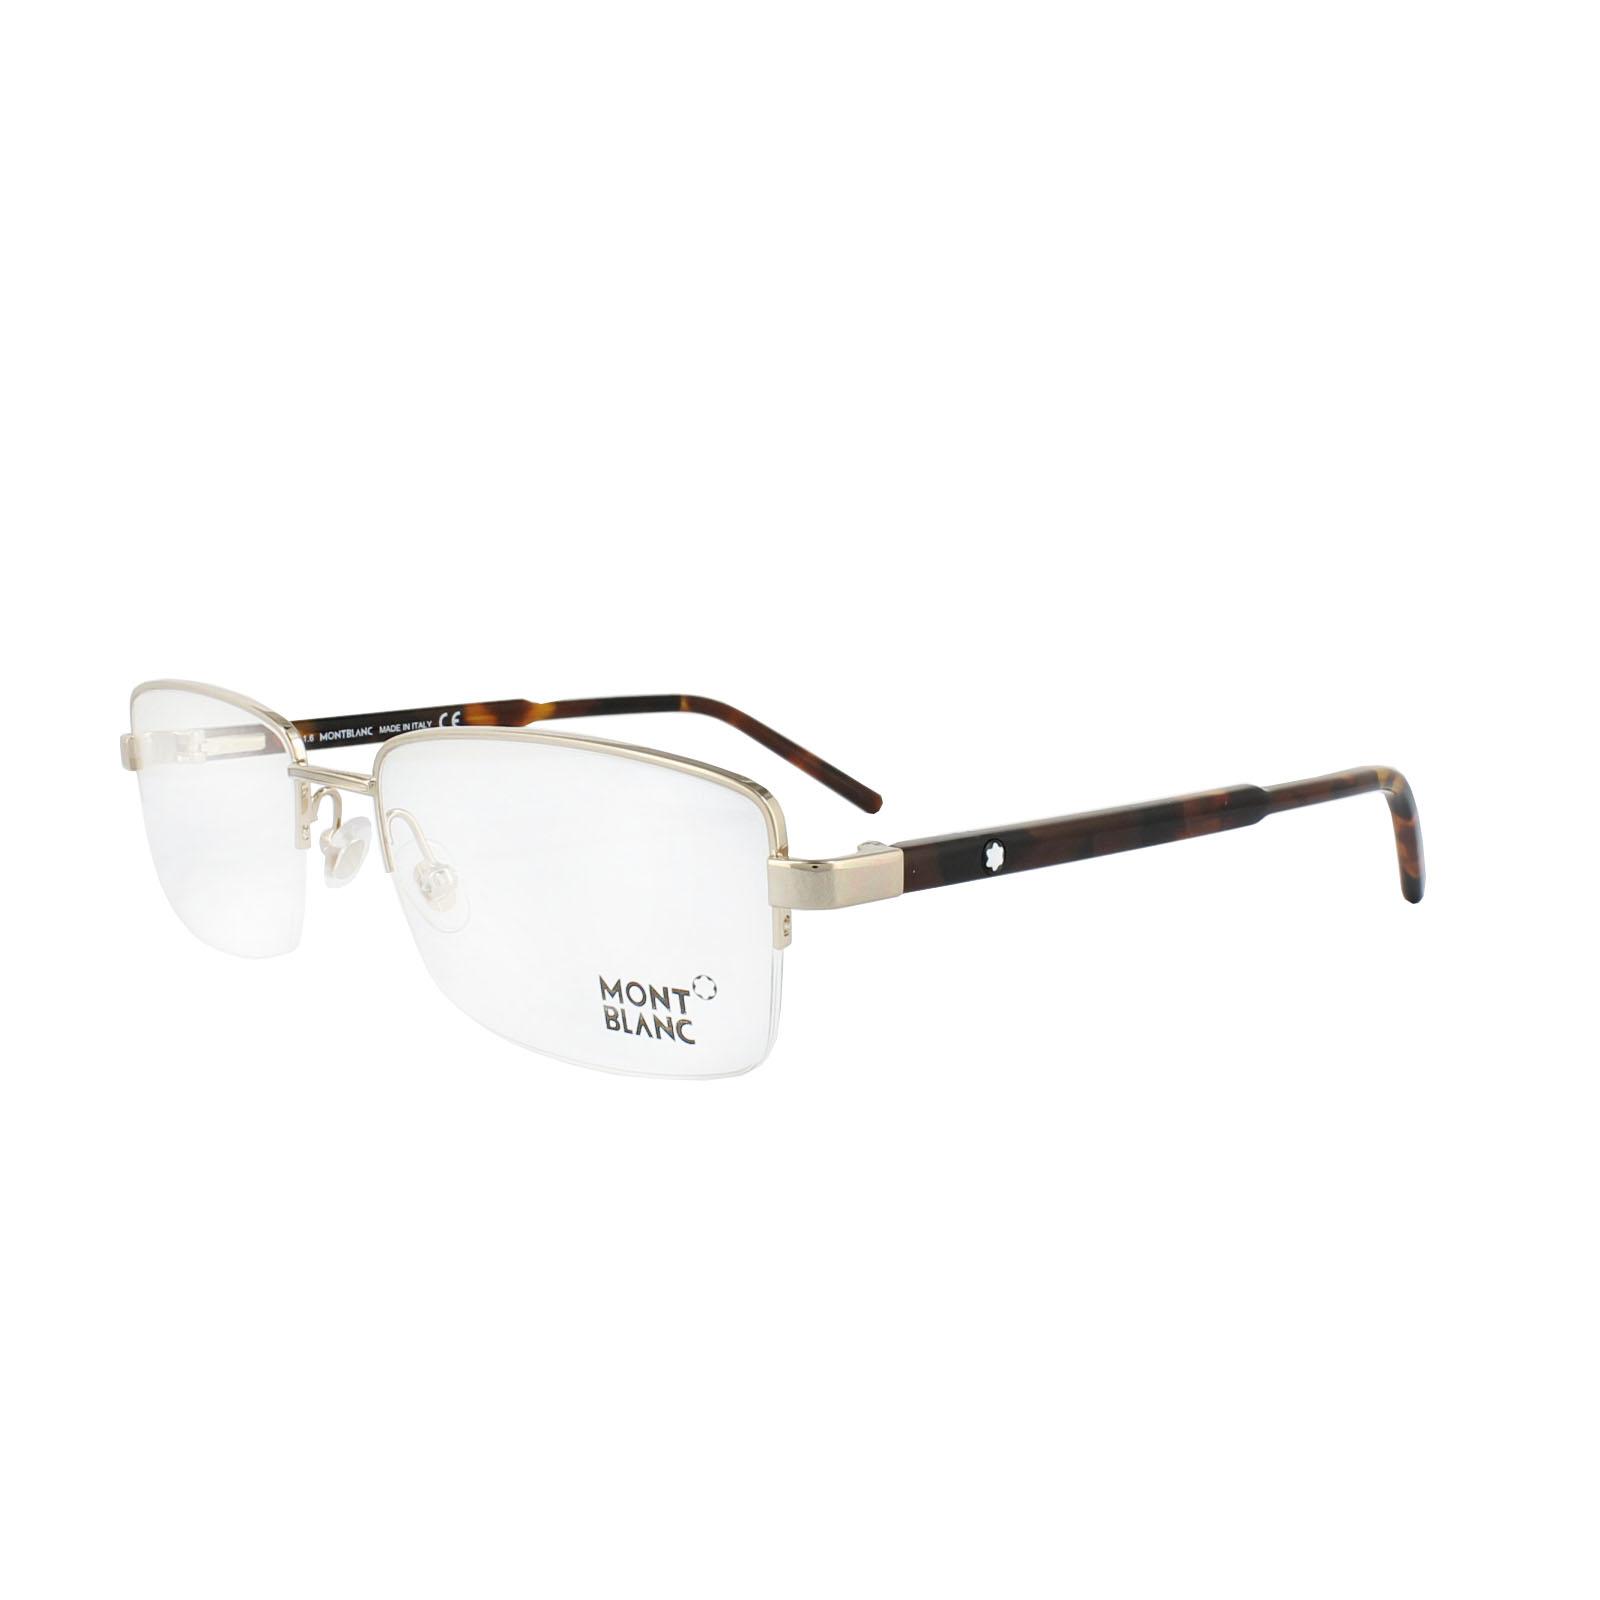 Sentinel Mont Blanc Glasses Frames 0581 028 Shiny Rose Gold   Black 7b804eb32353